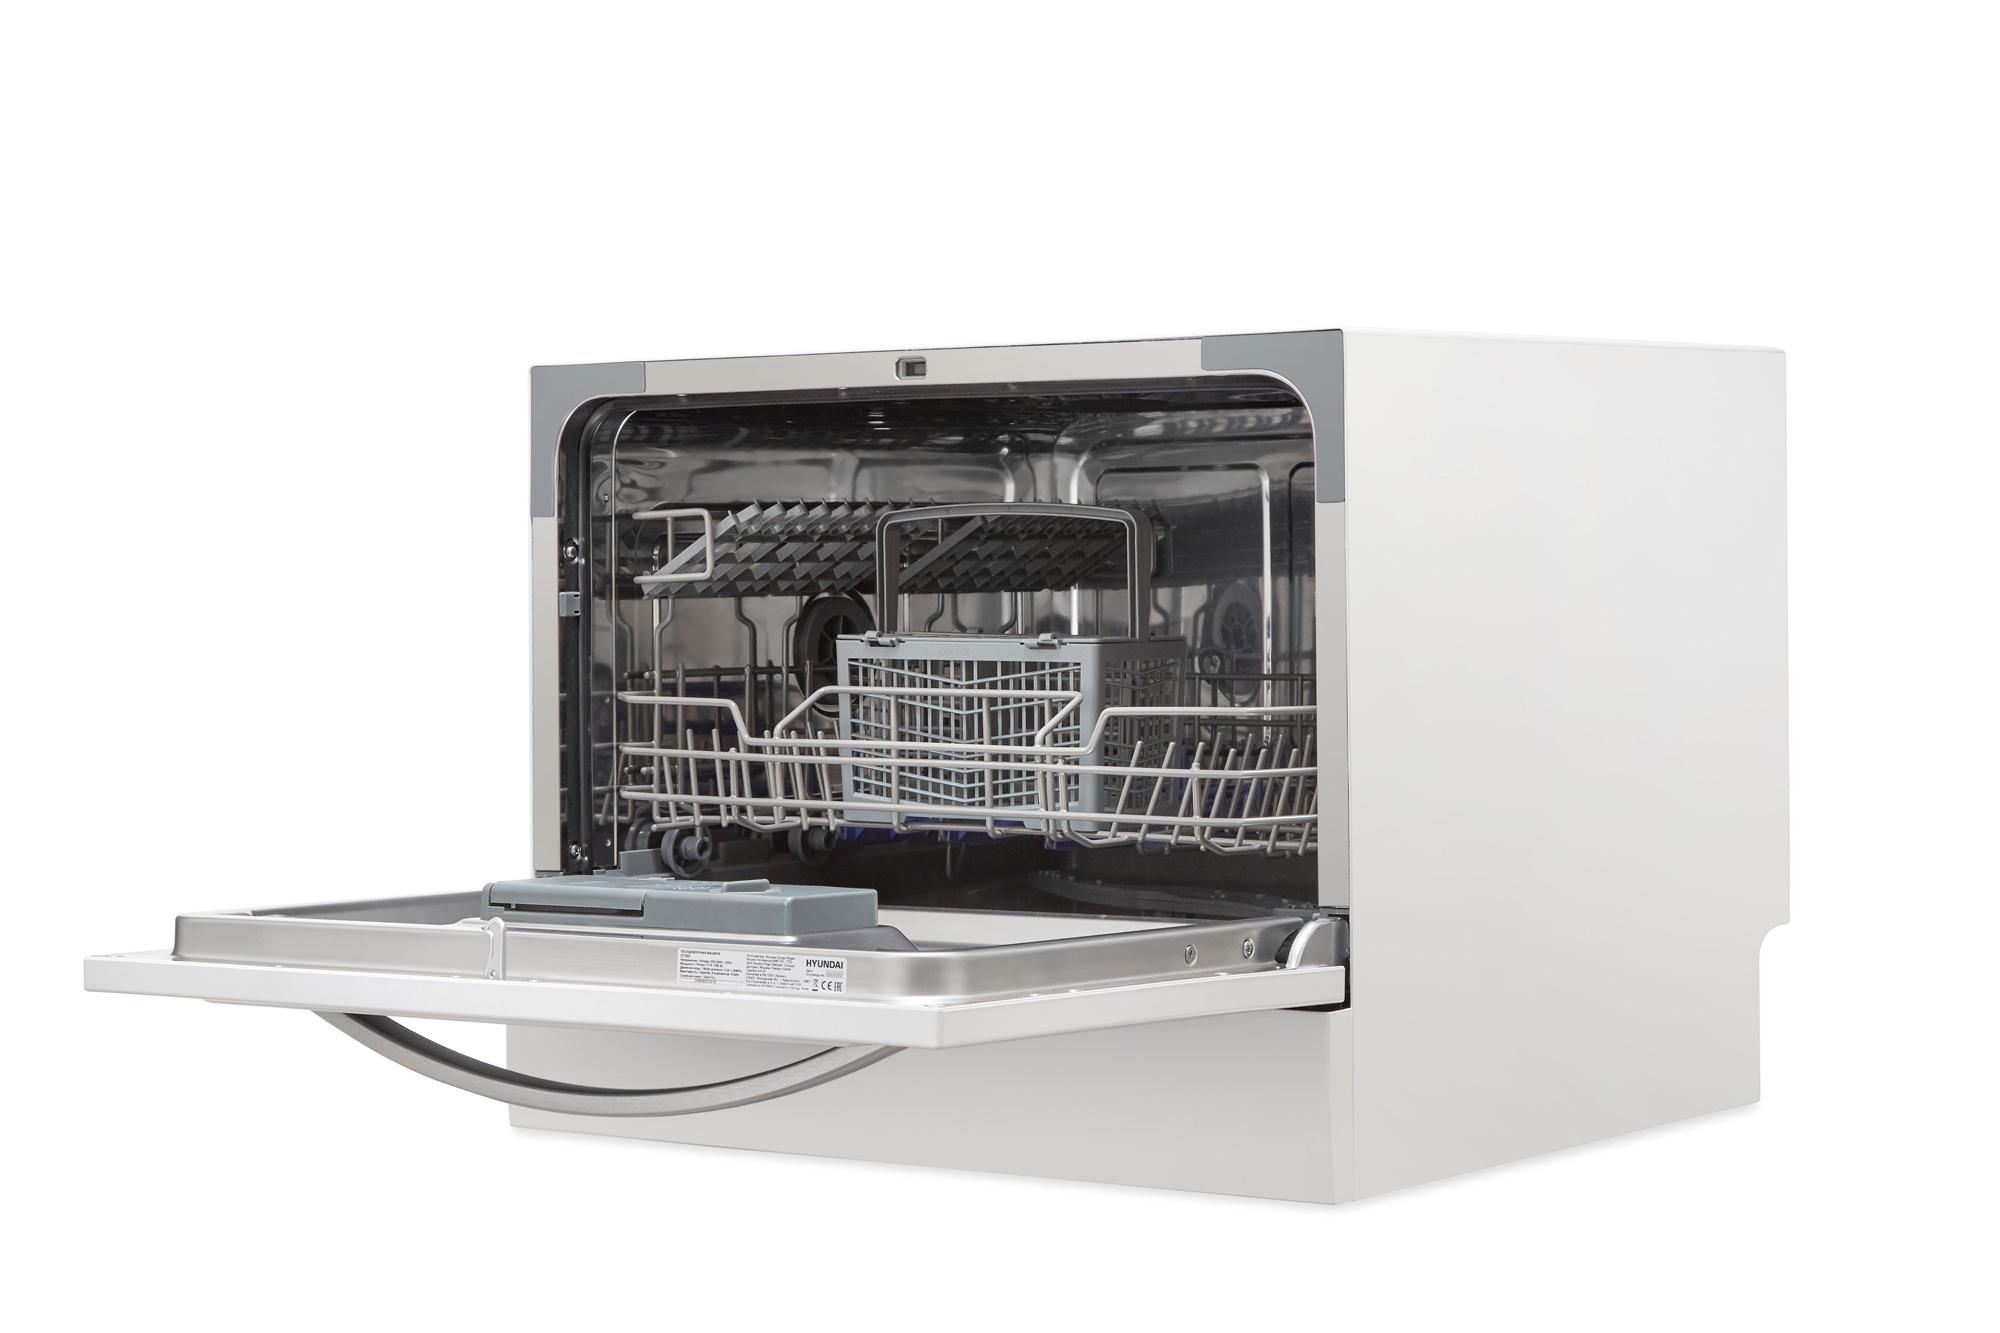 Посудомоечная машина Hyundai DT305 белый (компактная)